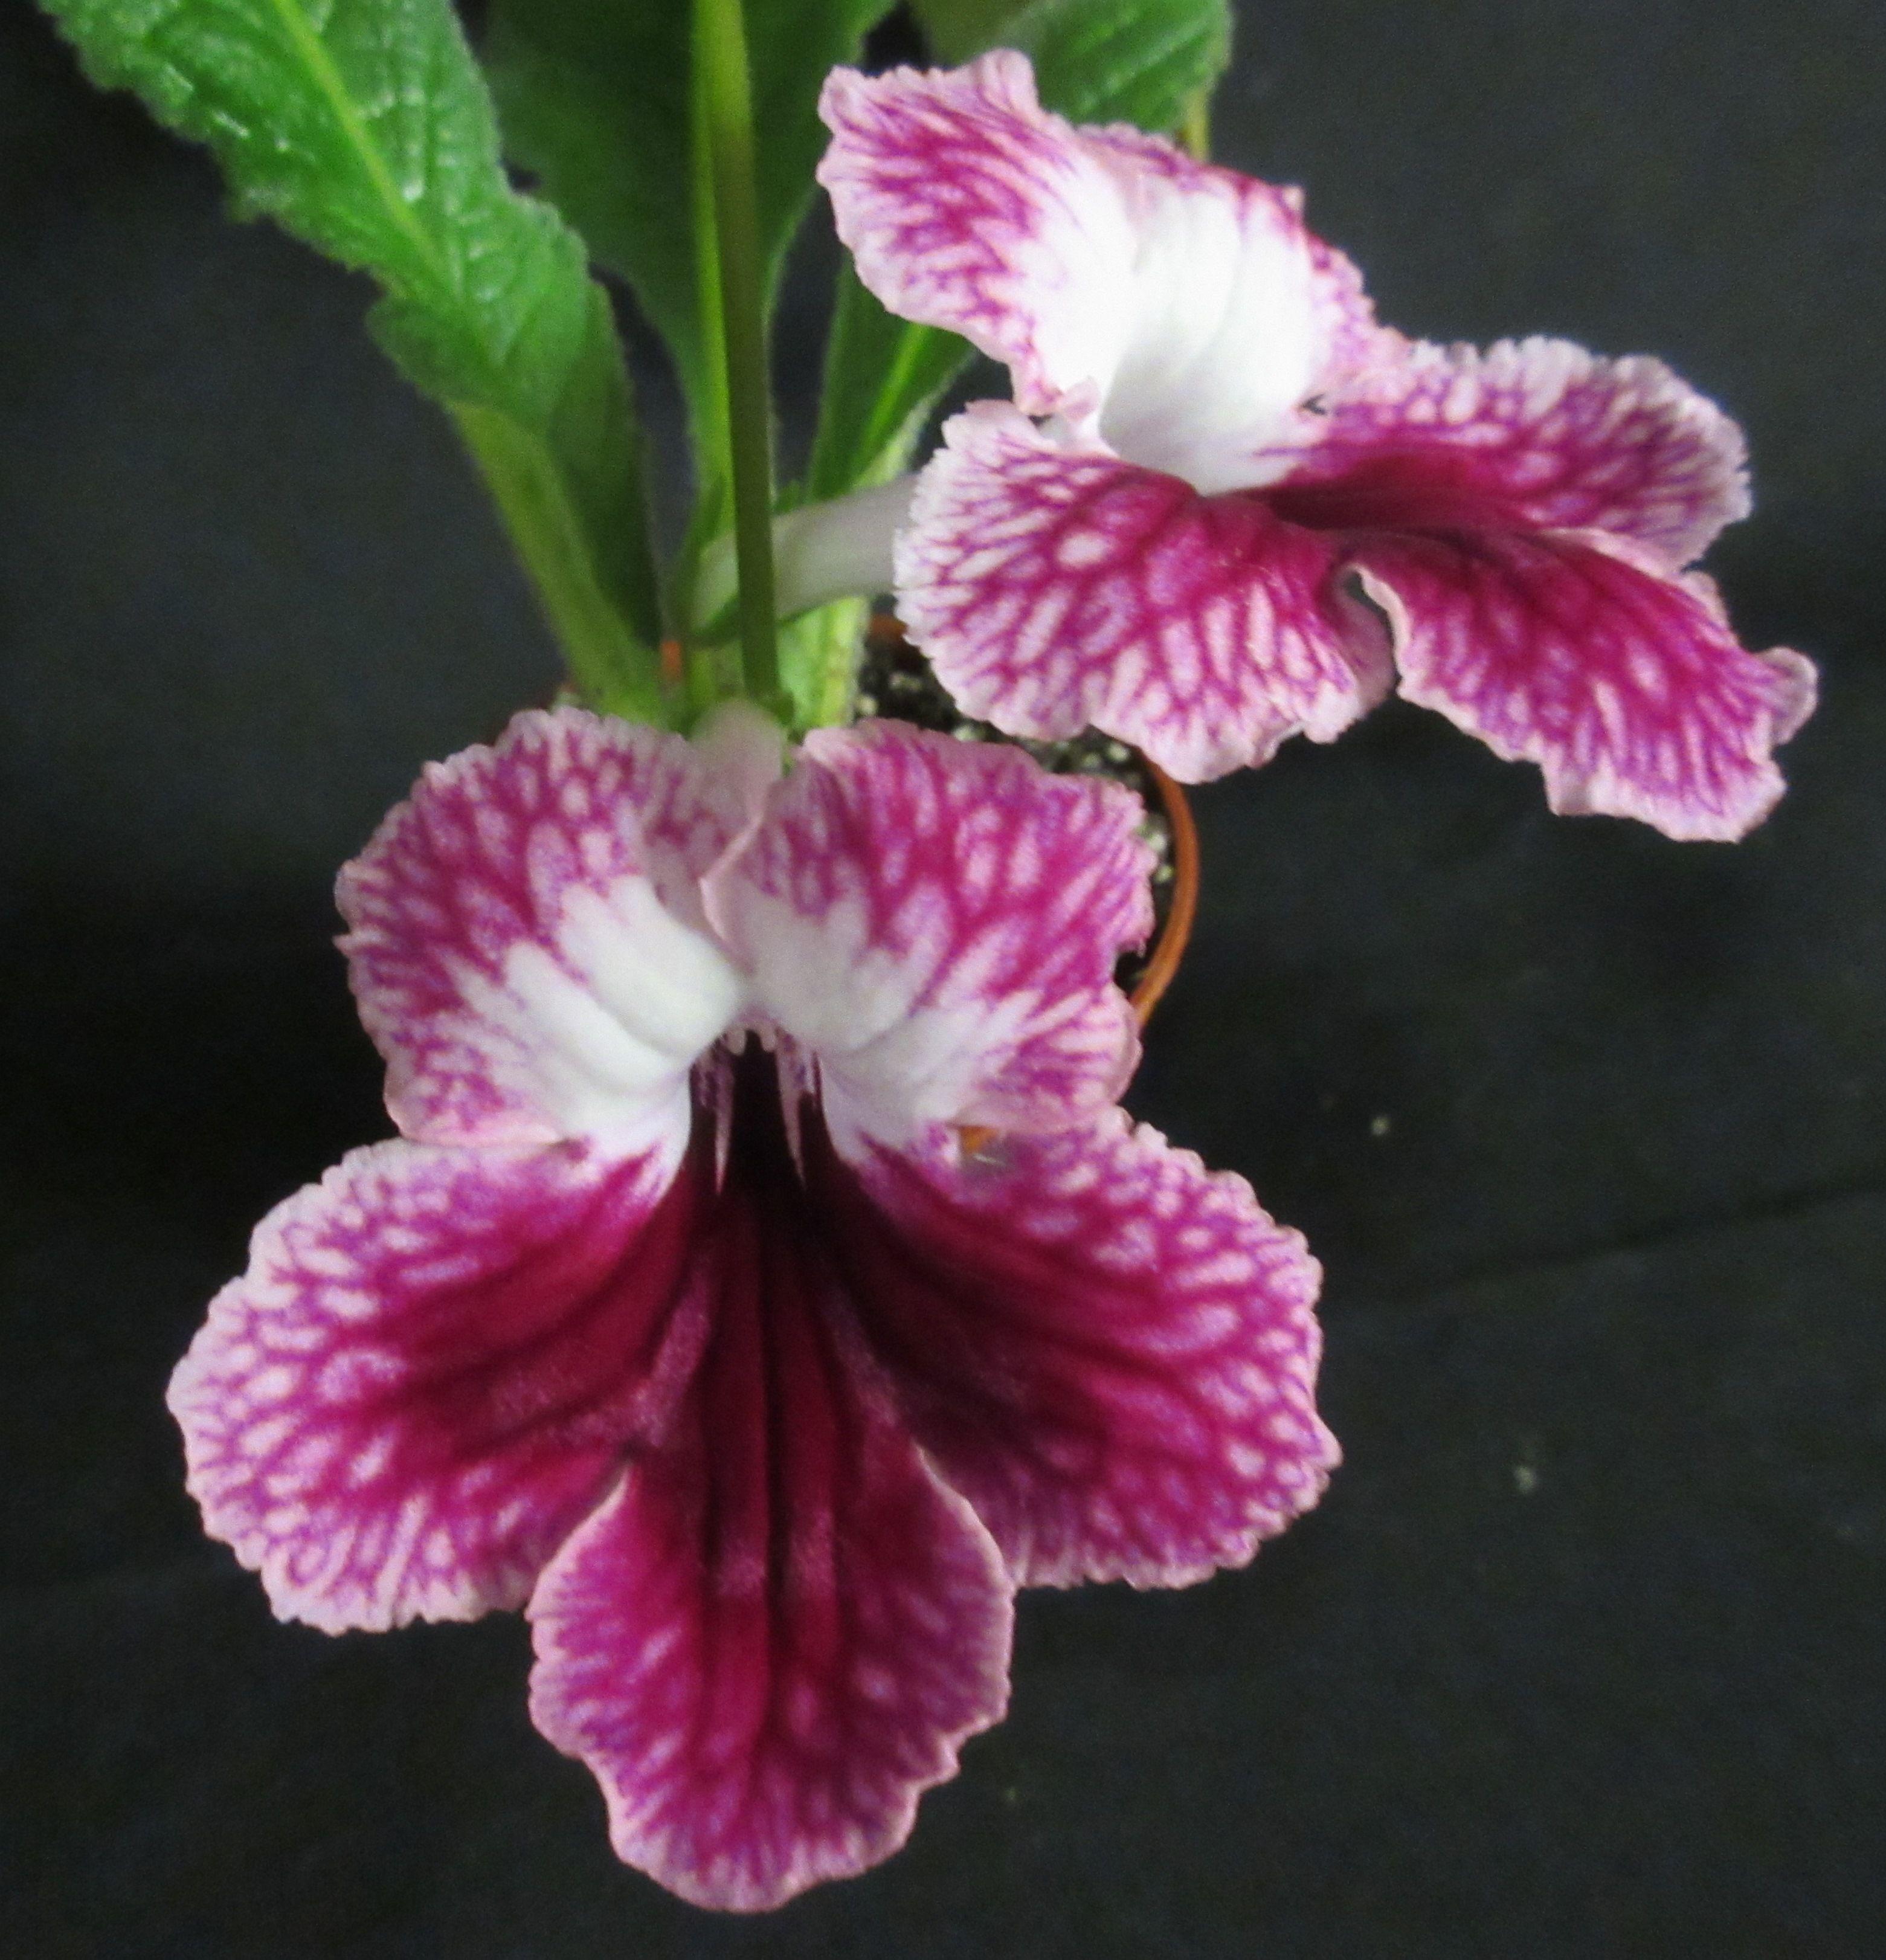 Streptocarpus Alabaster Rose AVSA africanviolet